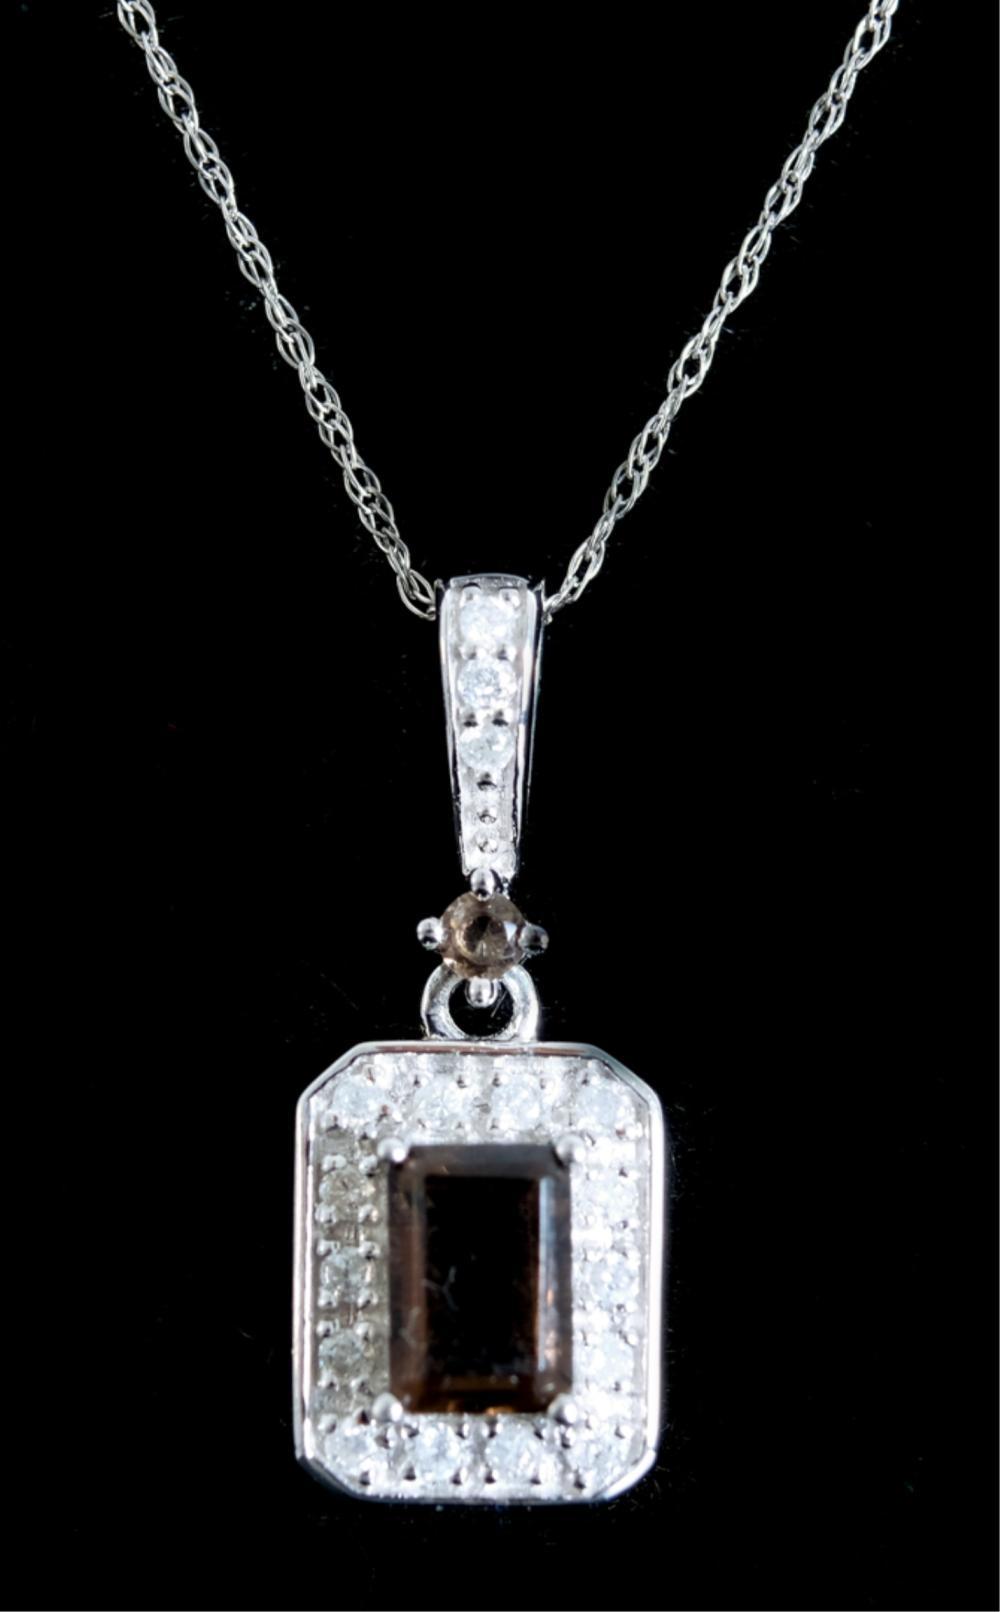 14k White Gold Topaz & Diamond Pendant Necklace